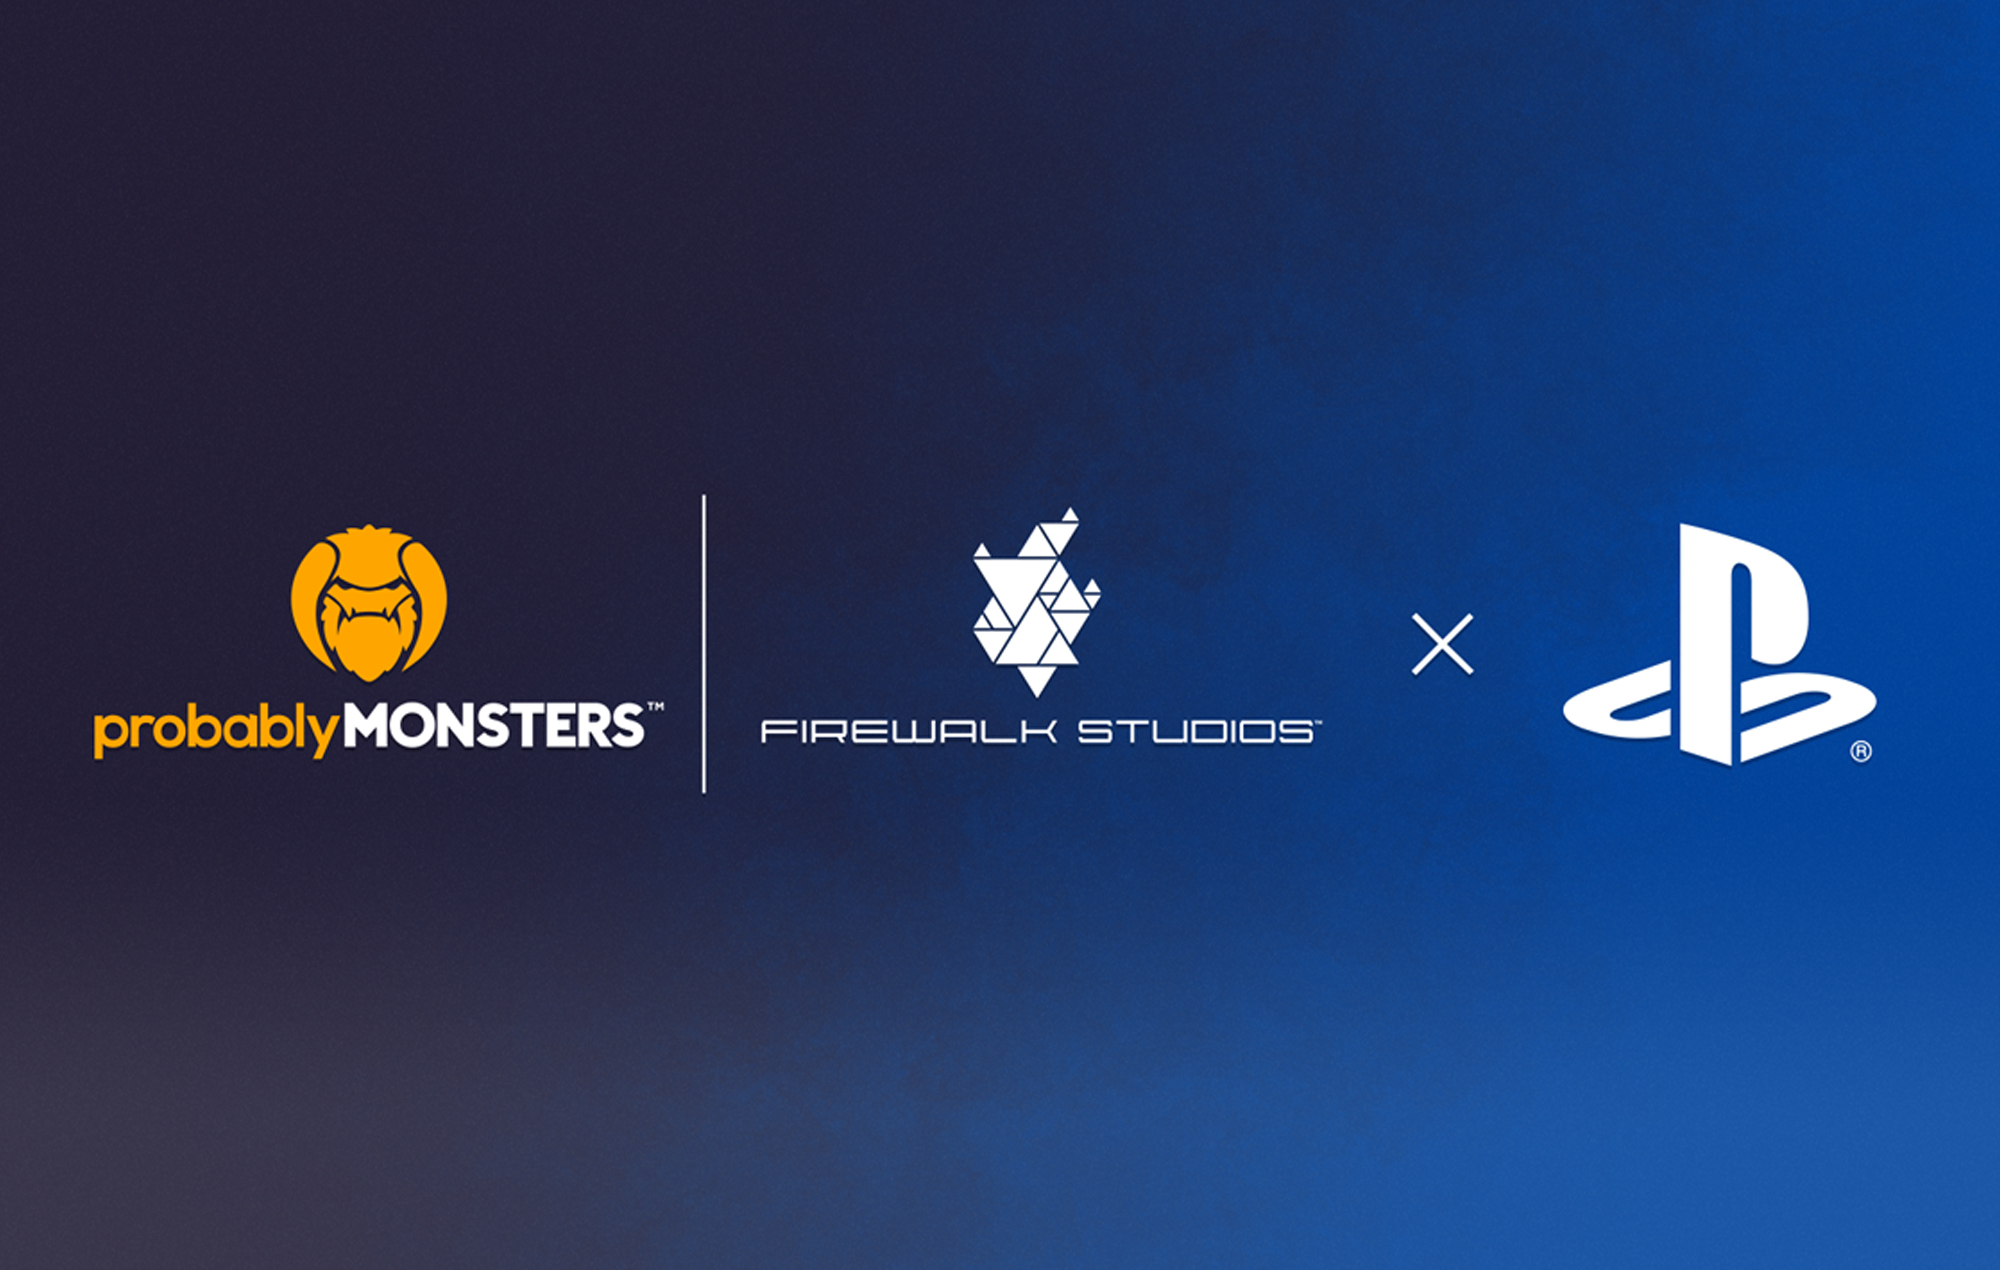 playstation/firewalk studios partnership